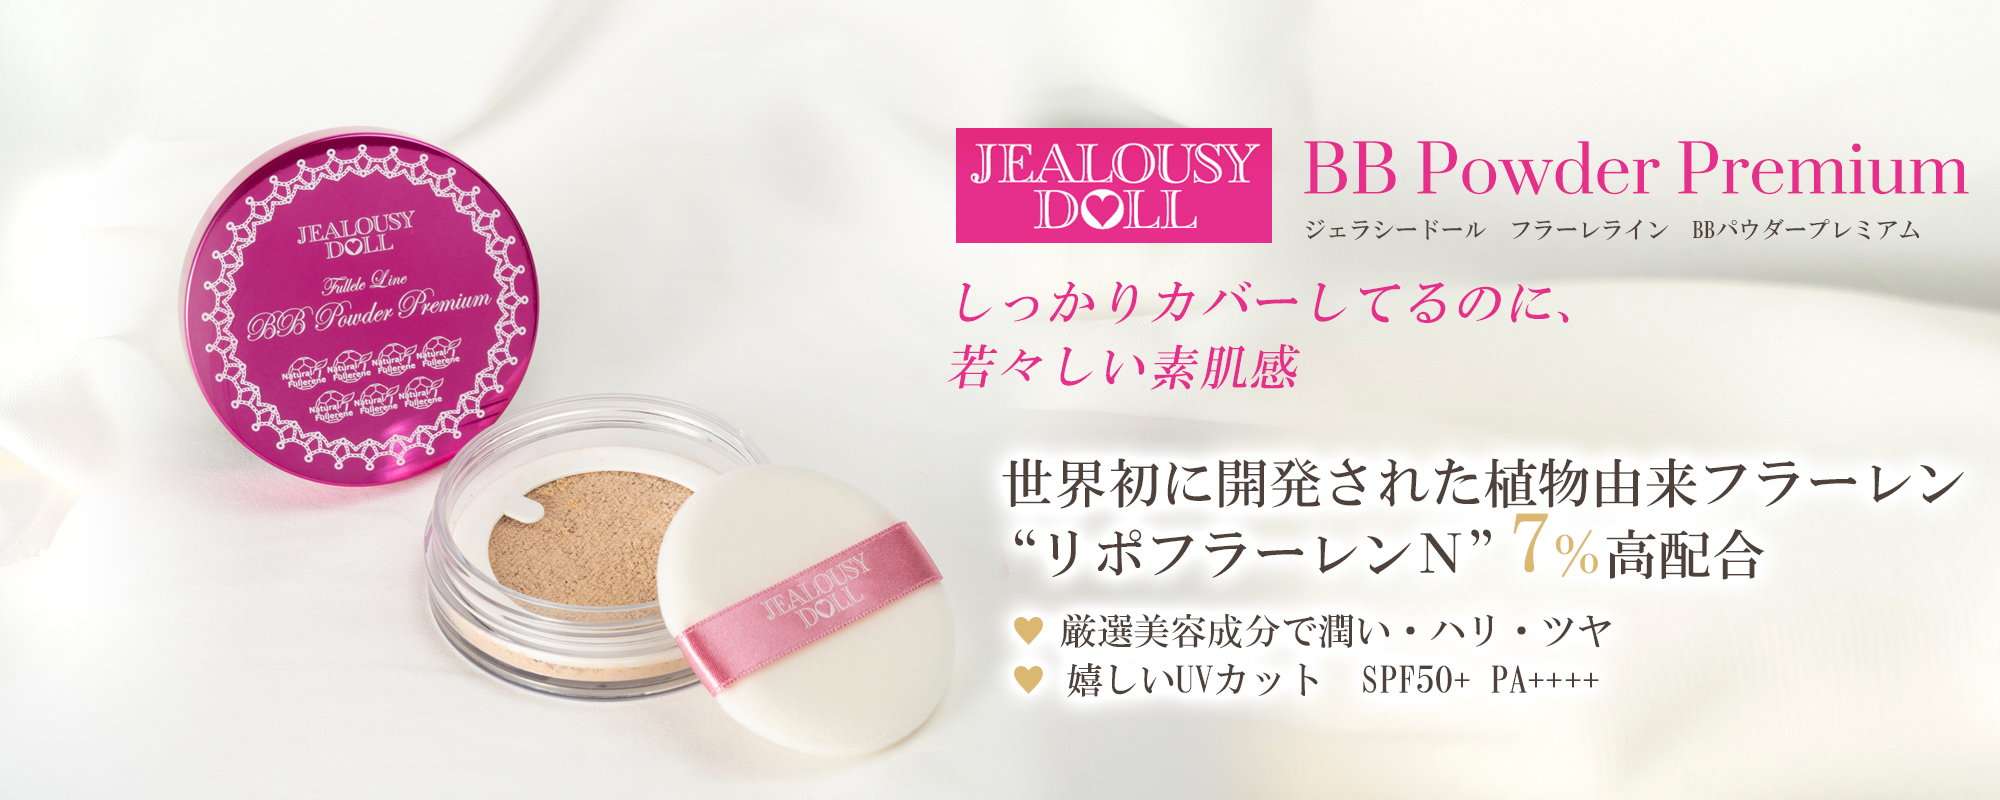 BB Powder Premium